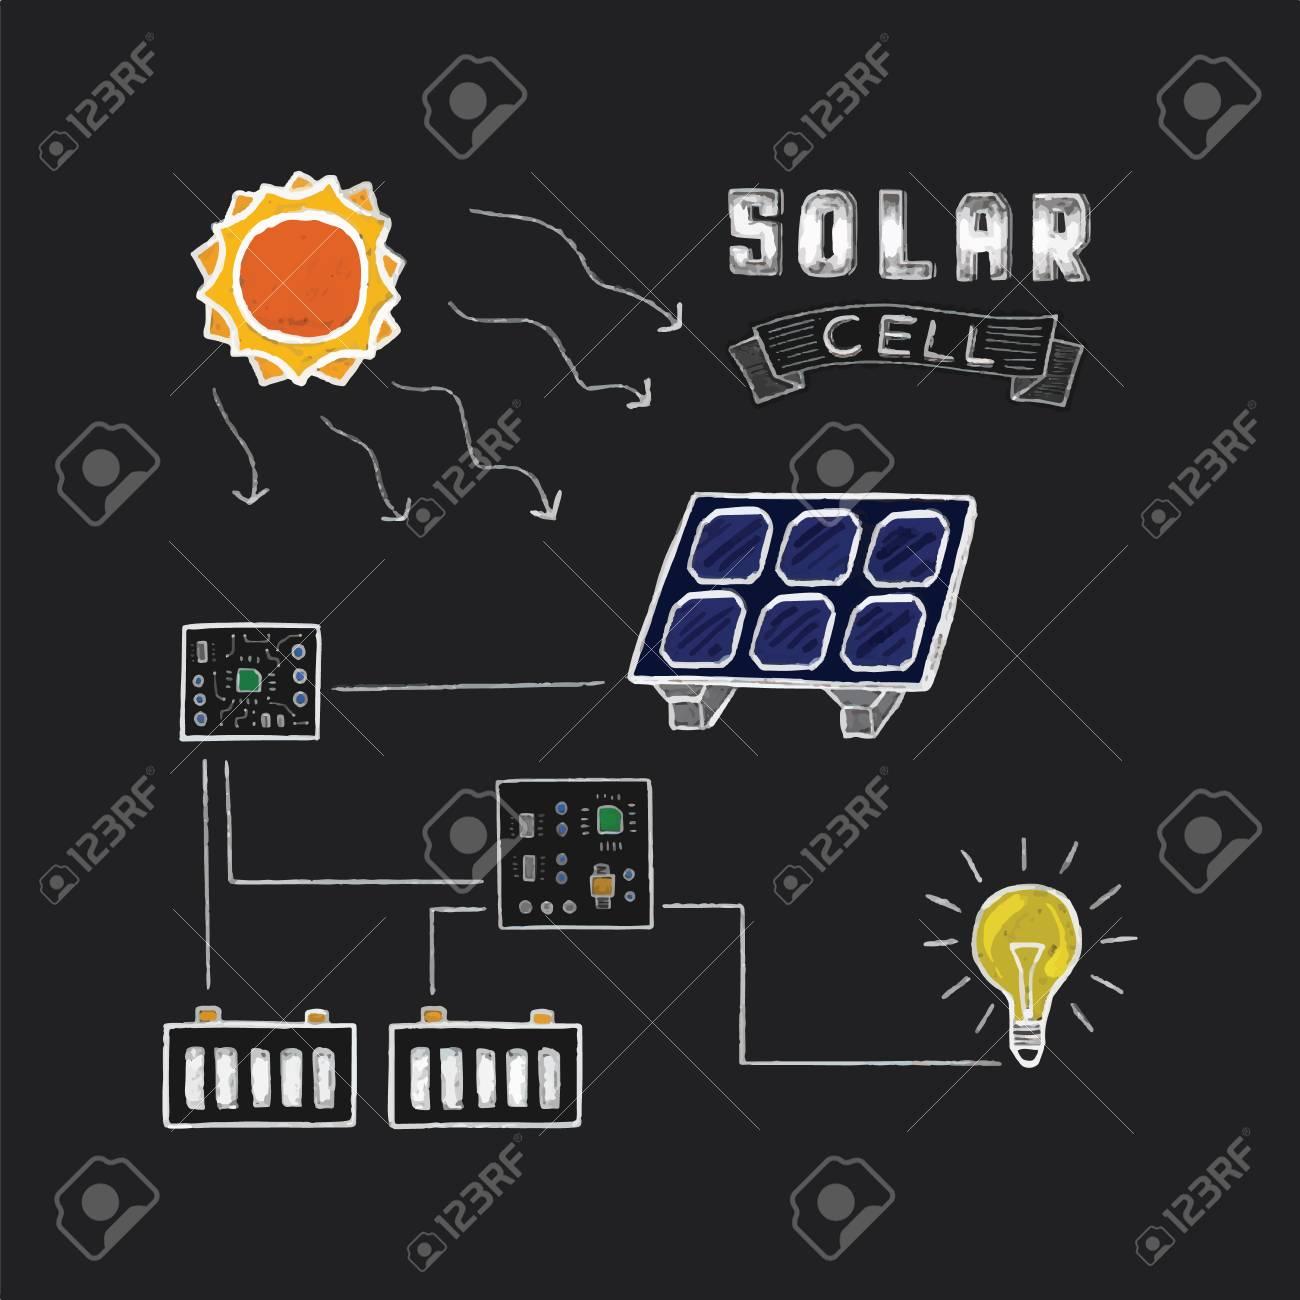 Solar Cell Wiring Diagram